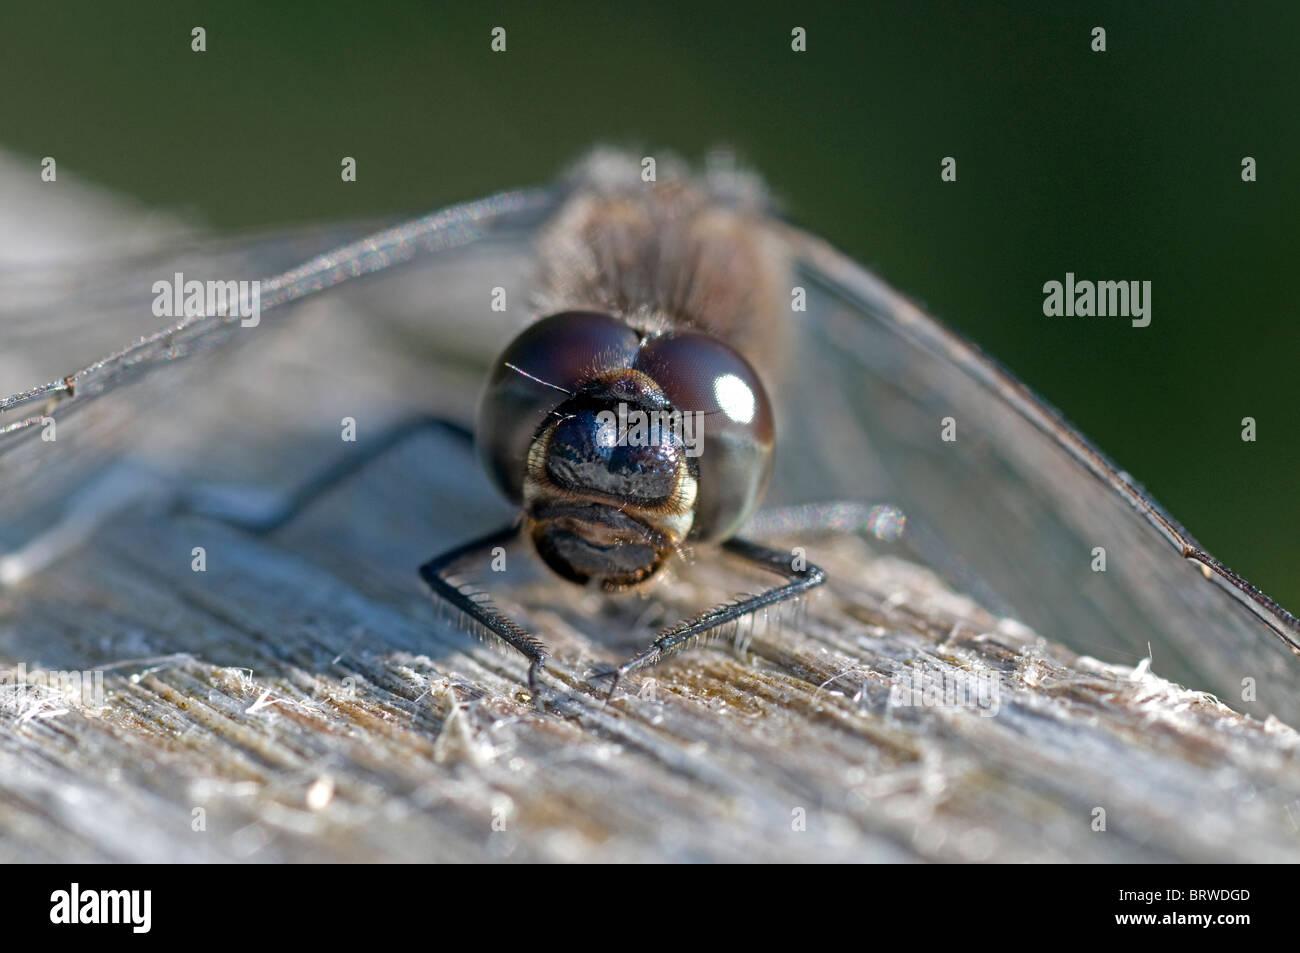 Black Darter Dragonfly Sunning on a park bench.  SCO 6836 Stock Photo